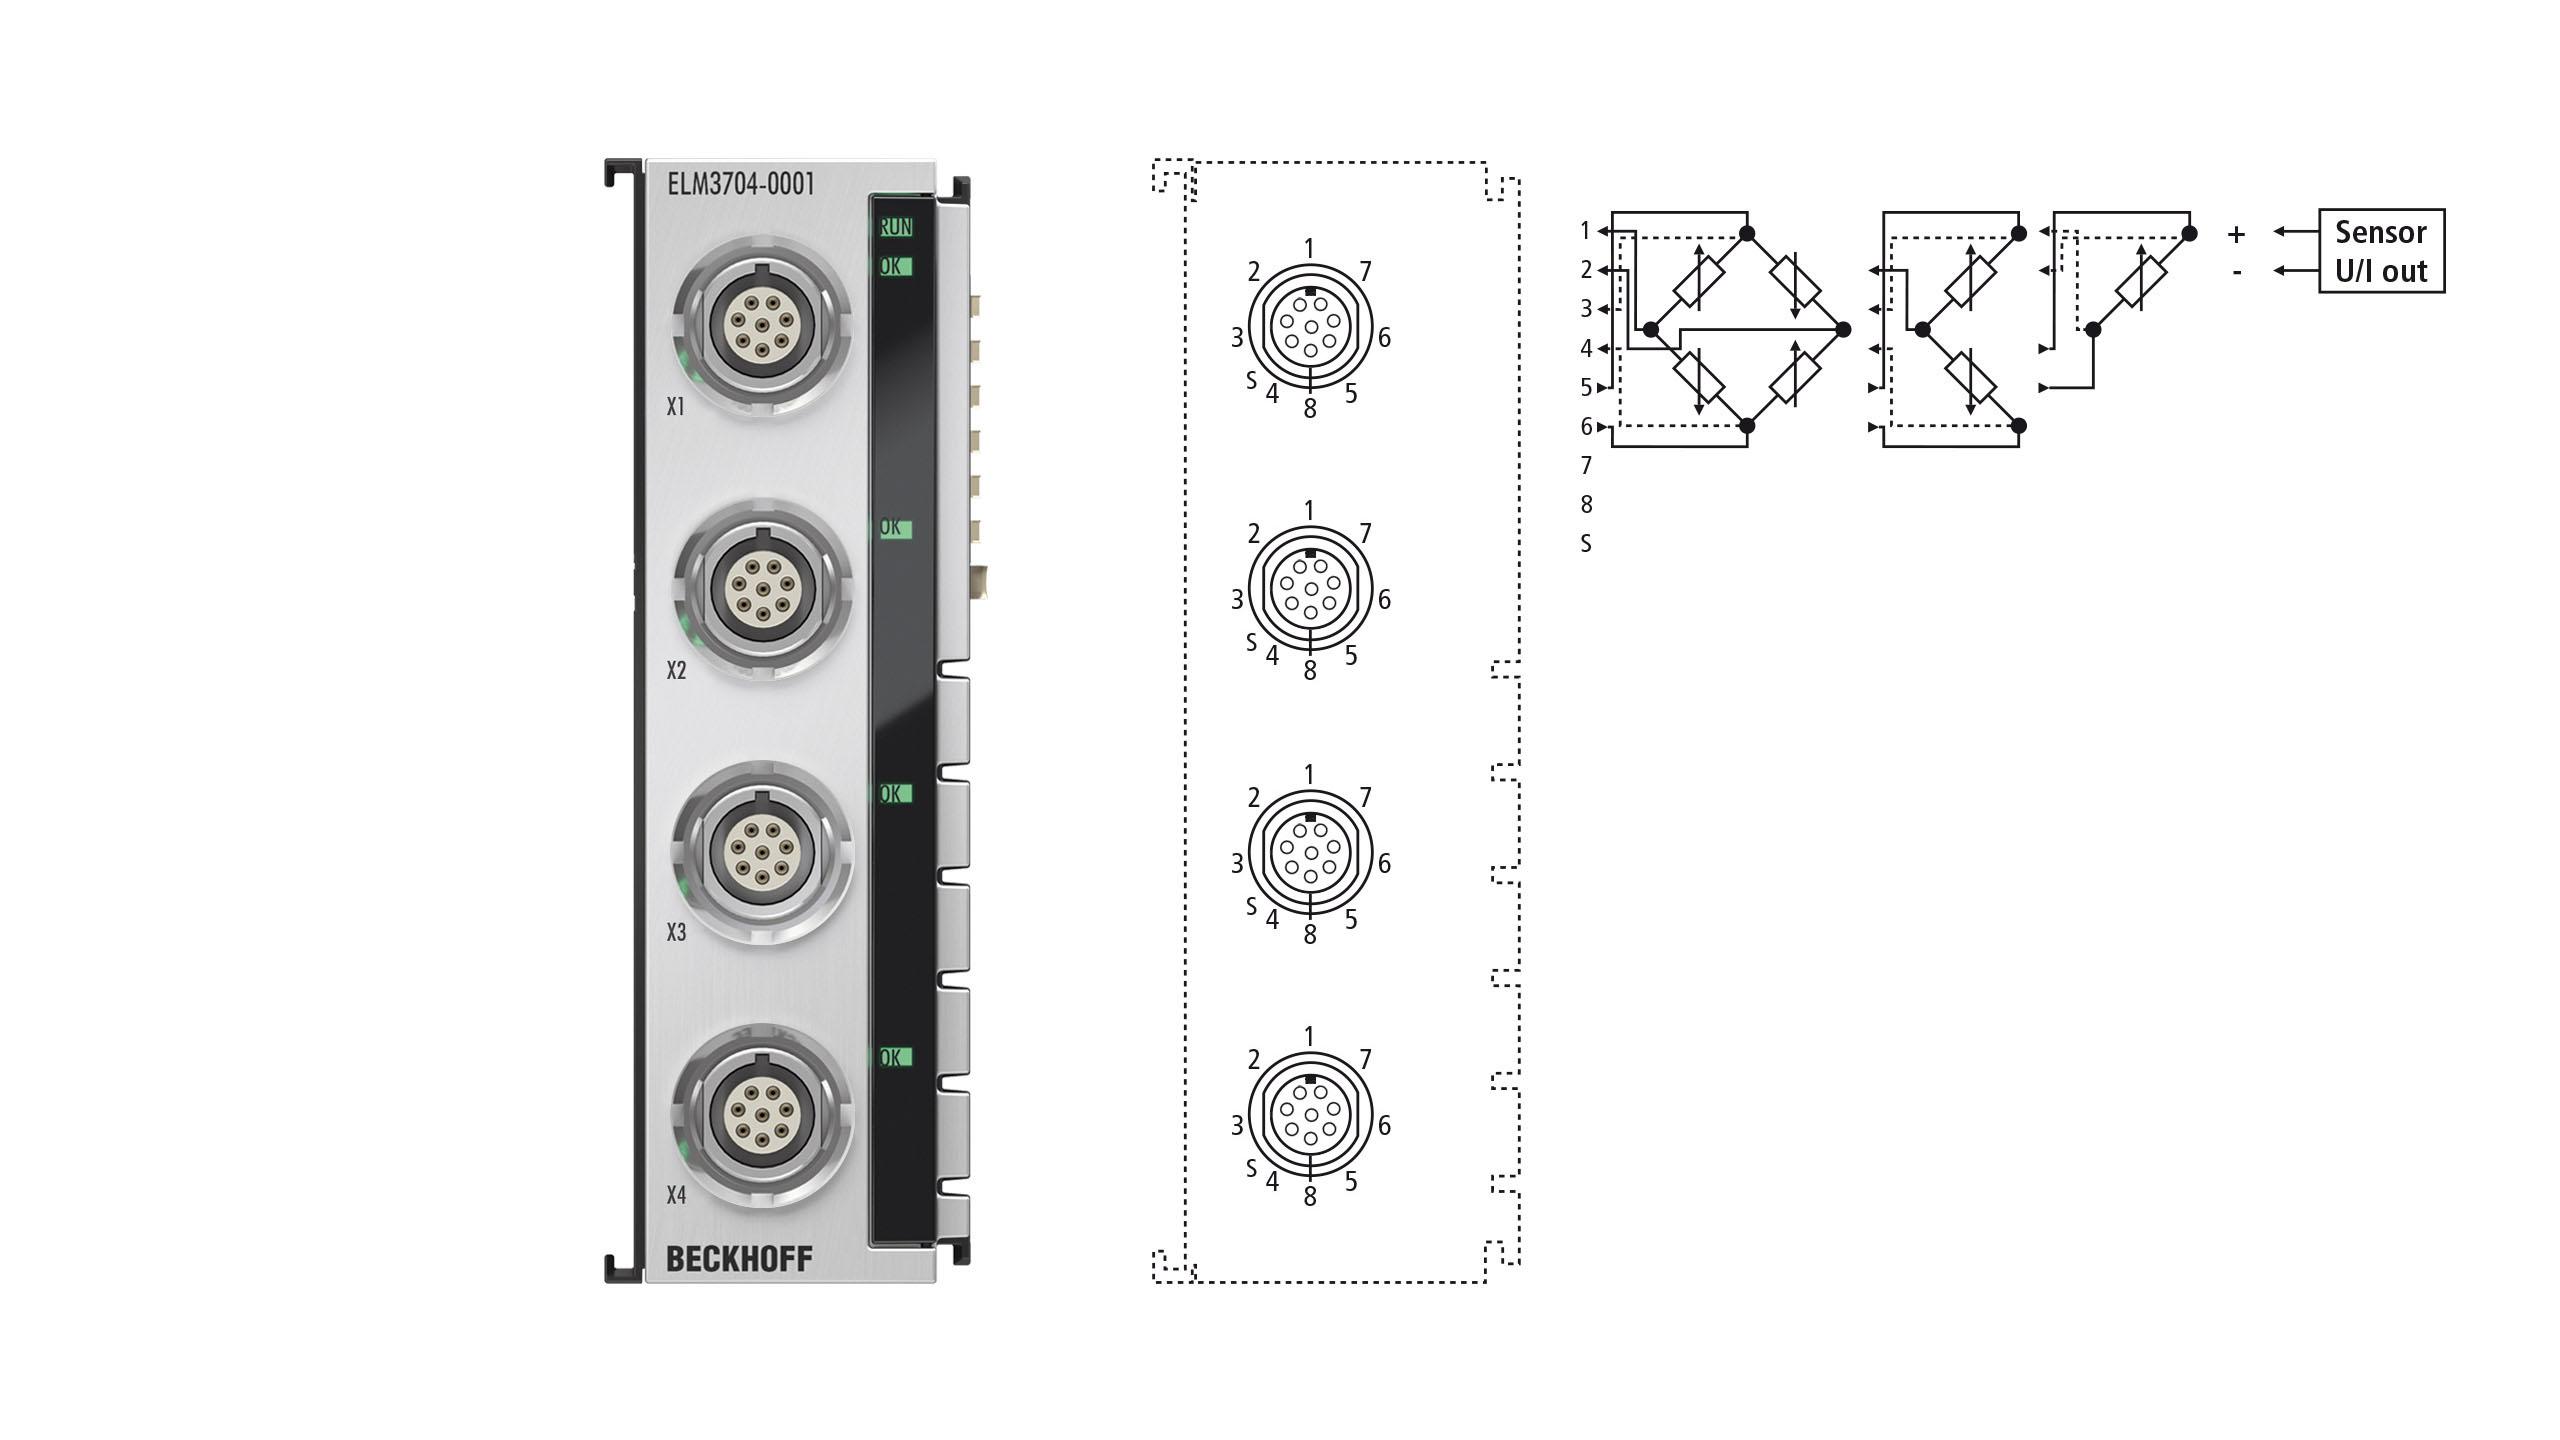 ELM3704-0001 | EtherCAT Terminal, 4-channel analog input, multi-function, 24bit, 10ksps, LEMO